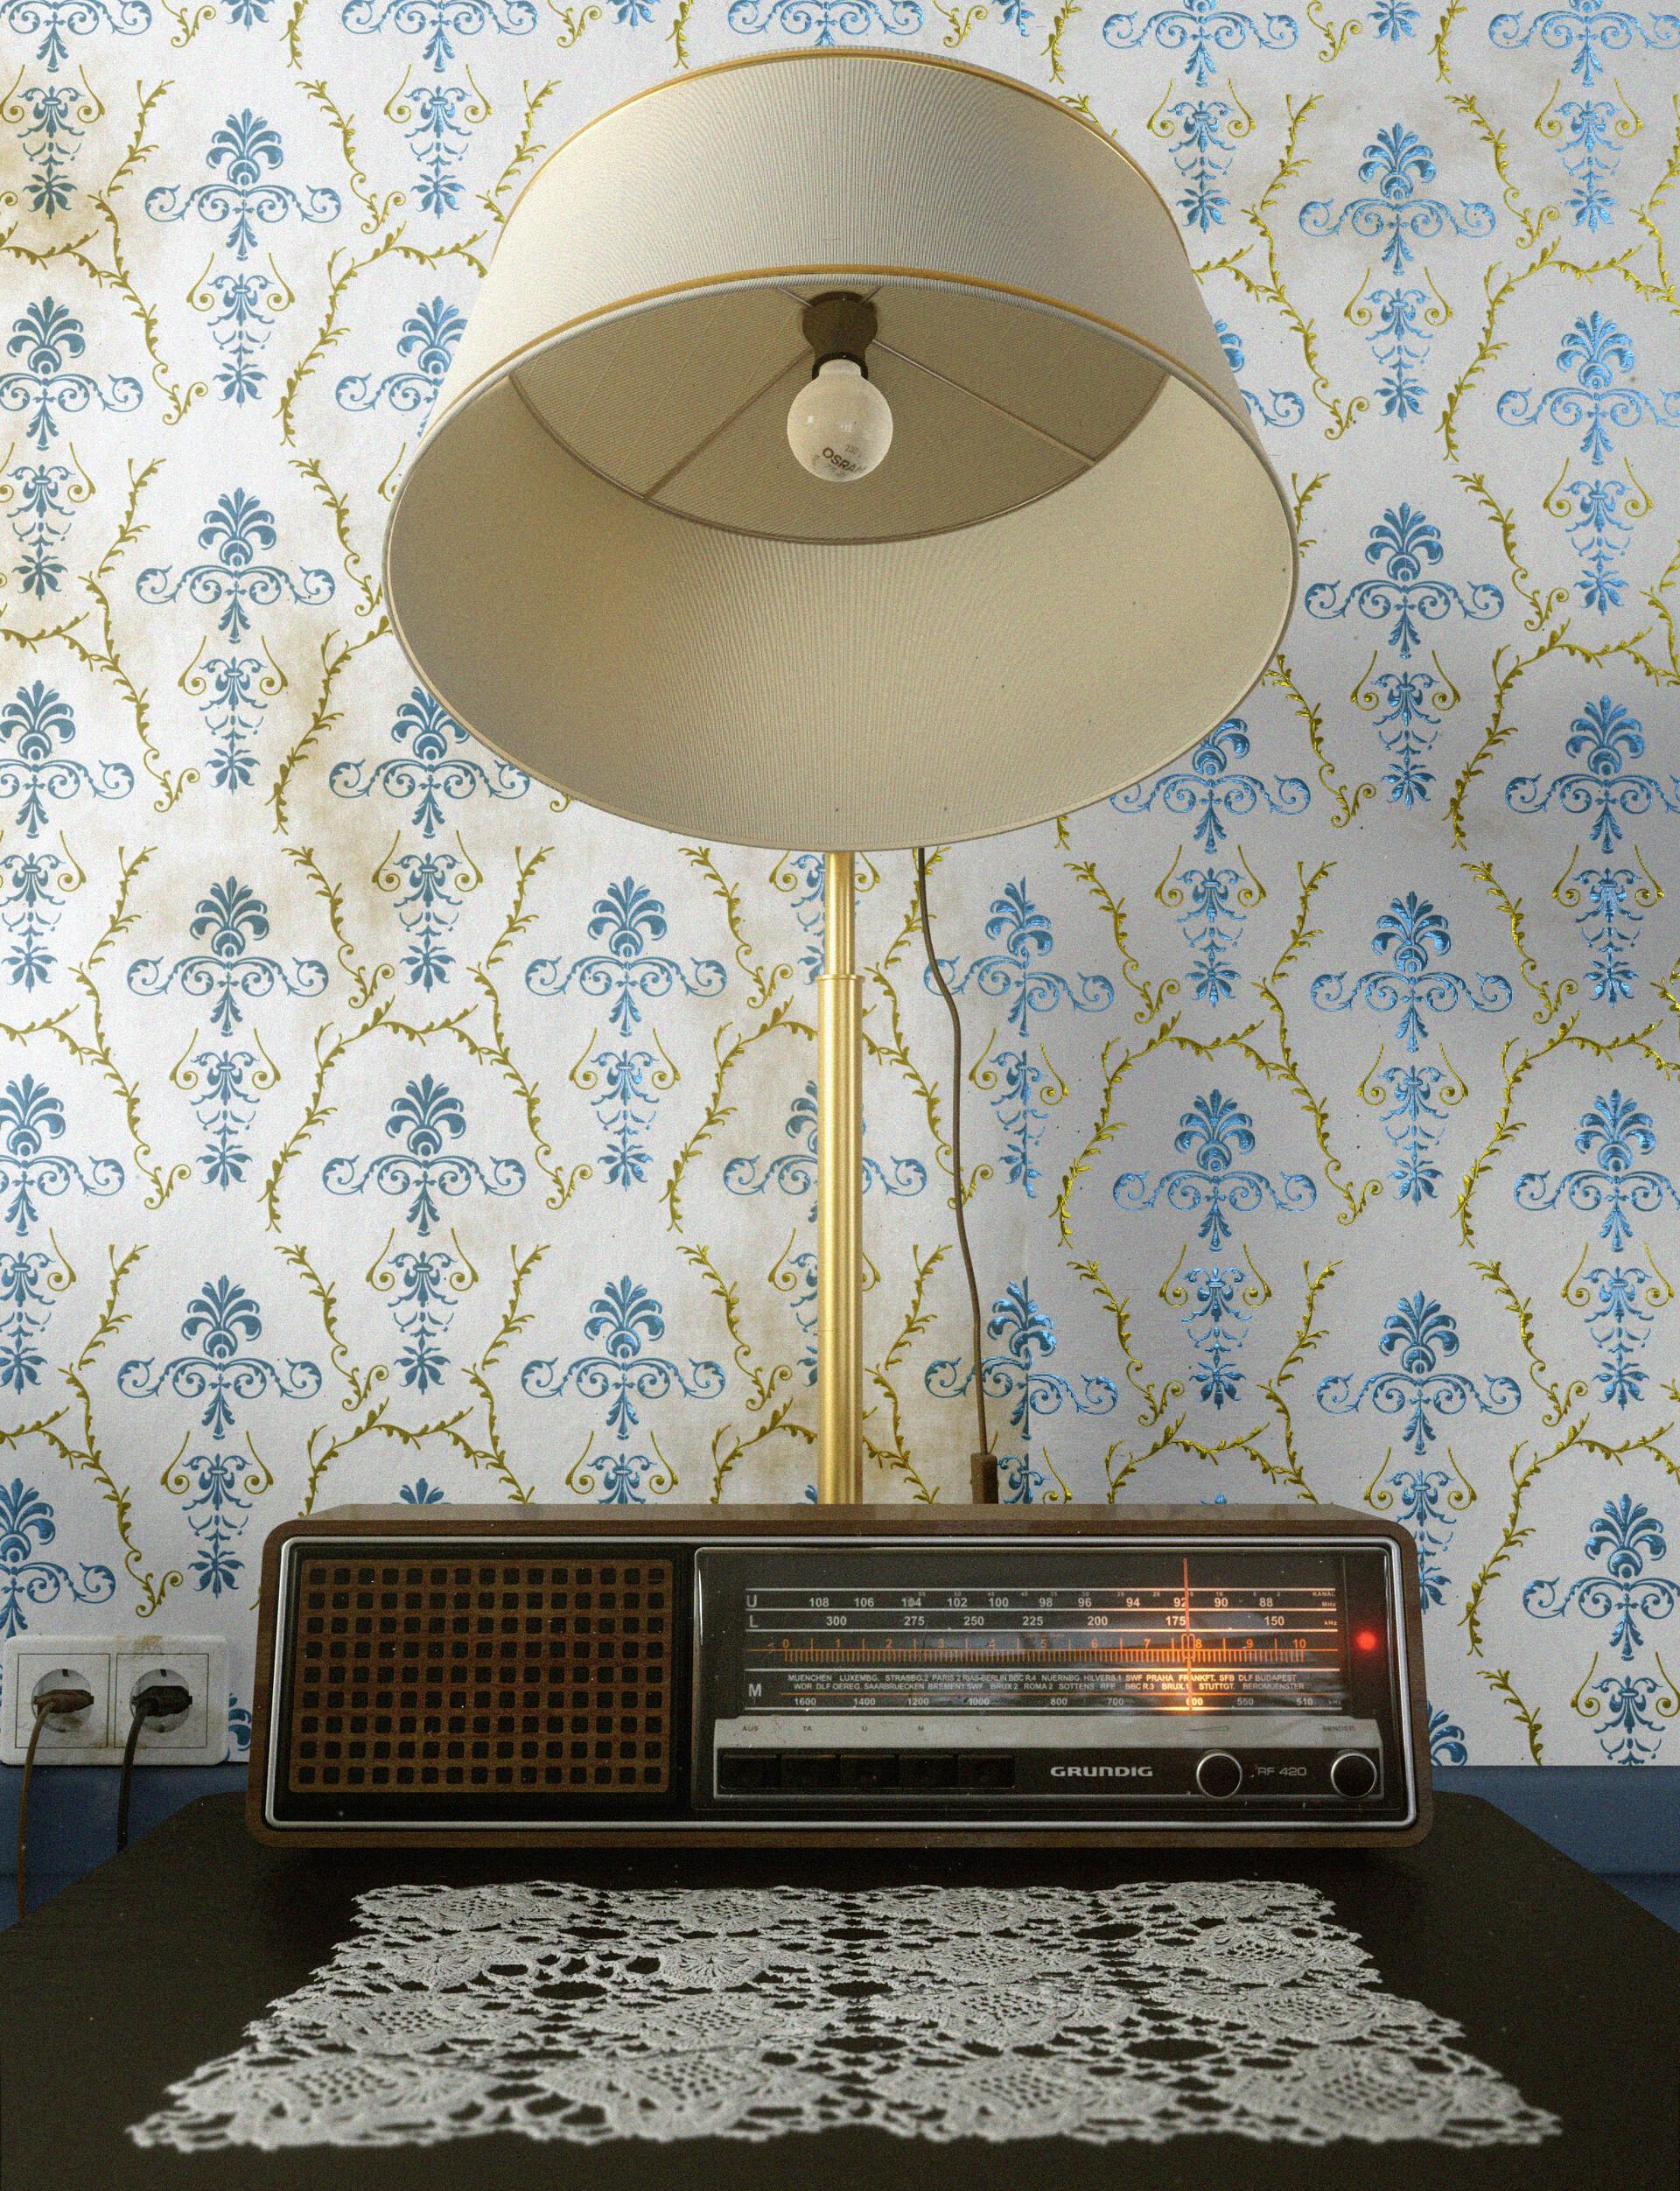 Torsten dudai old radio